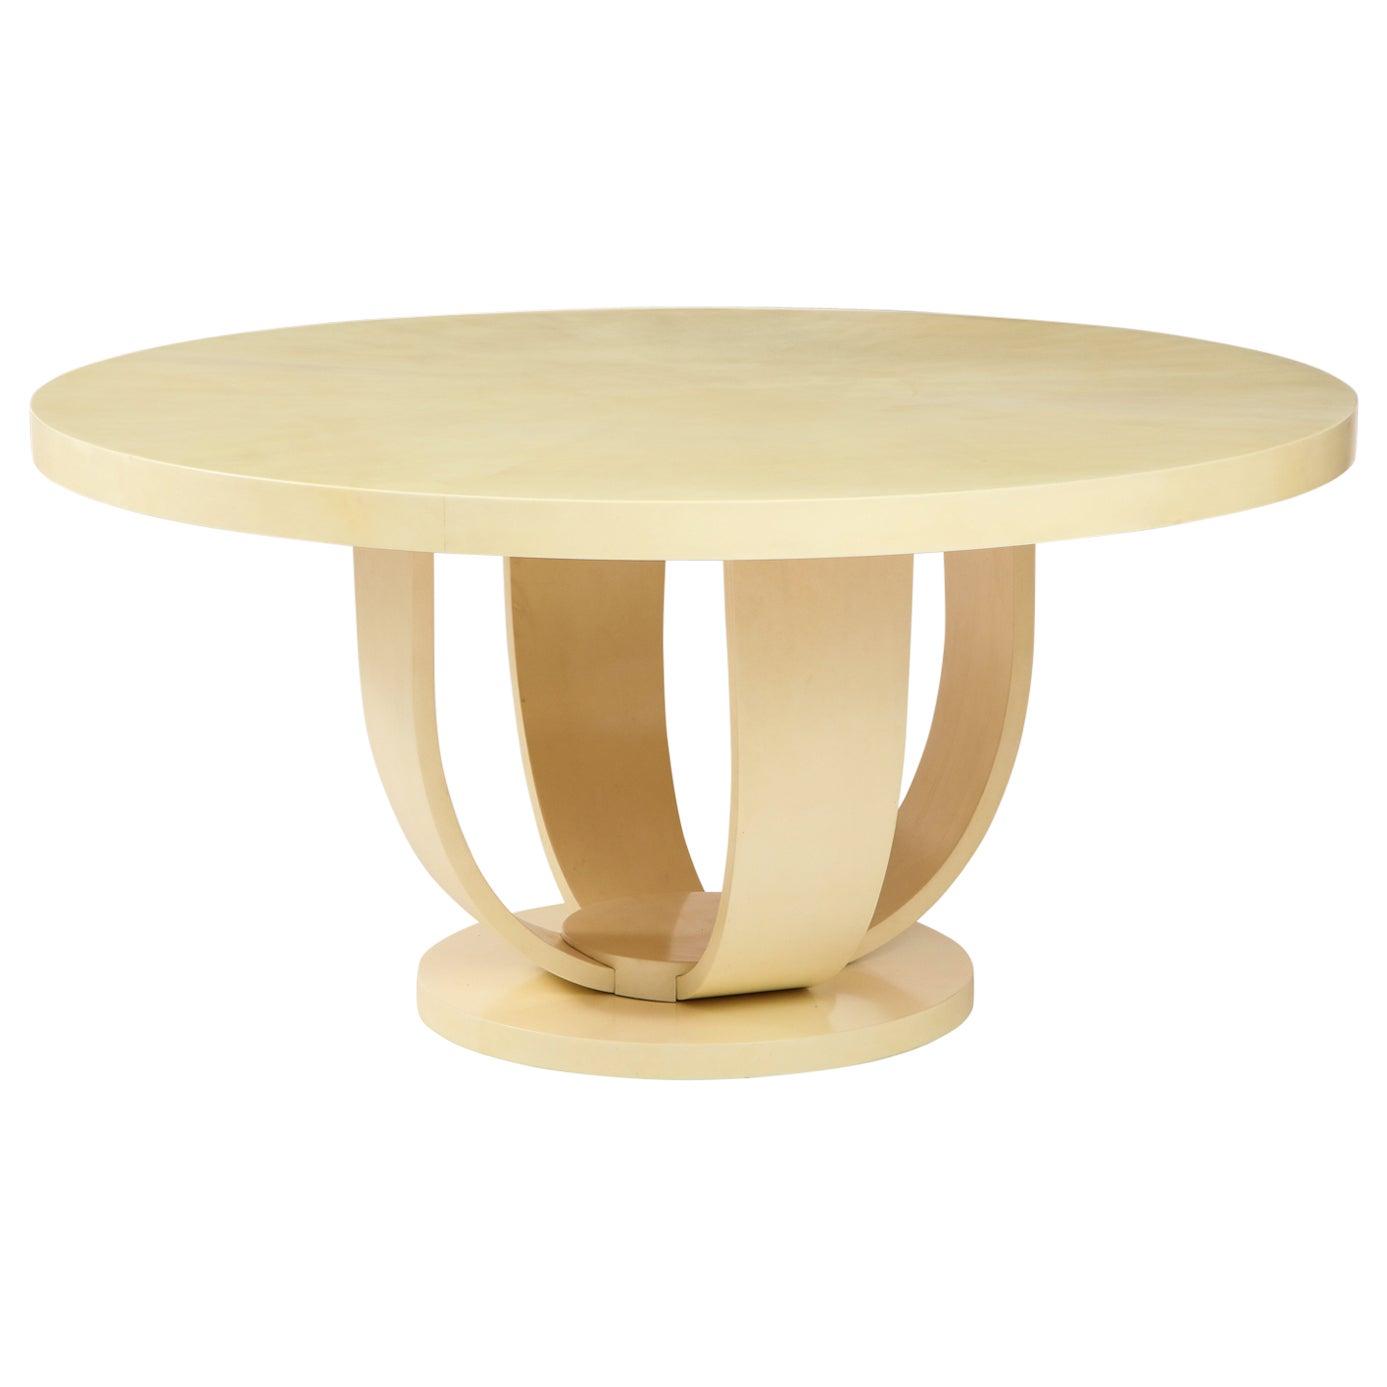 Aldo Tura Unique Goatskin Dining or Center Table